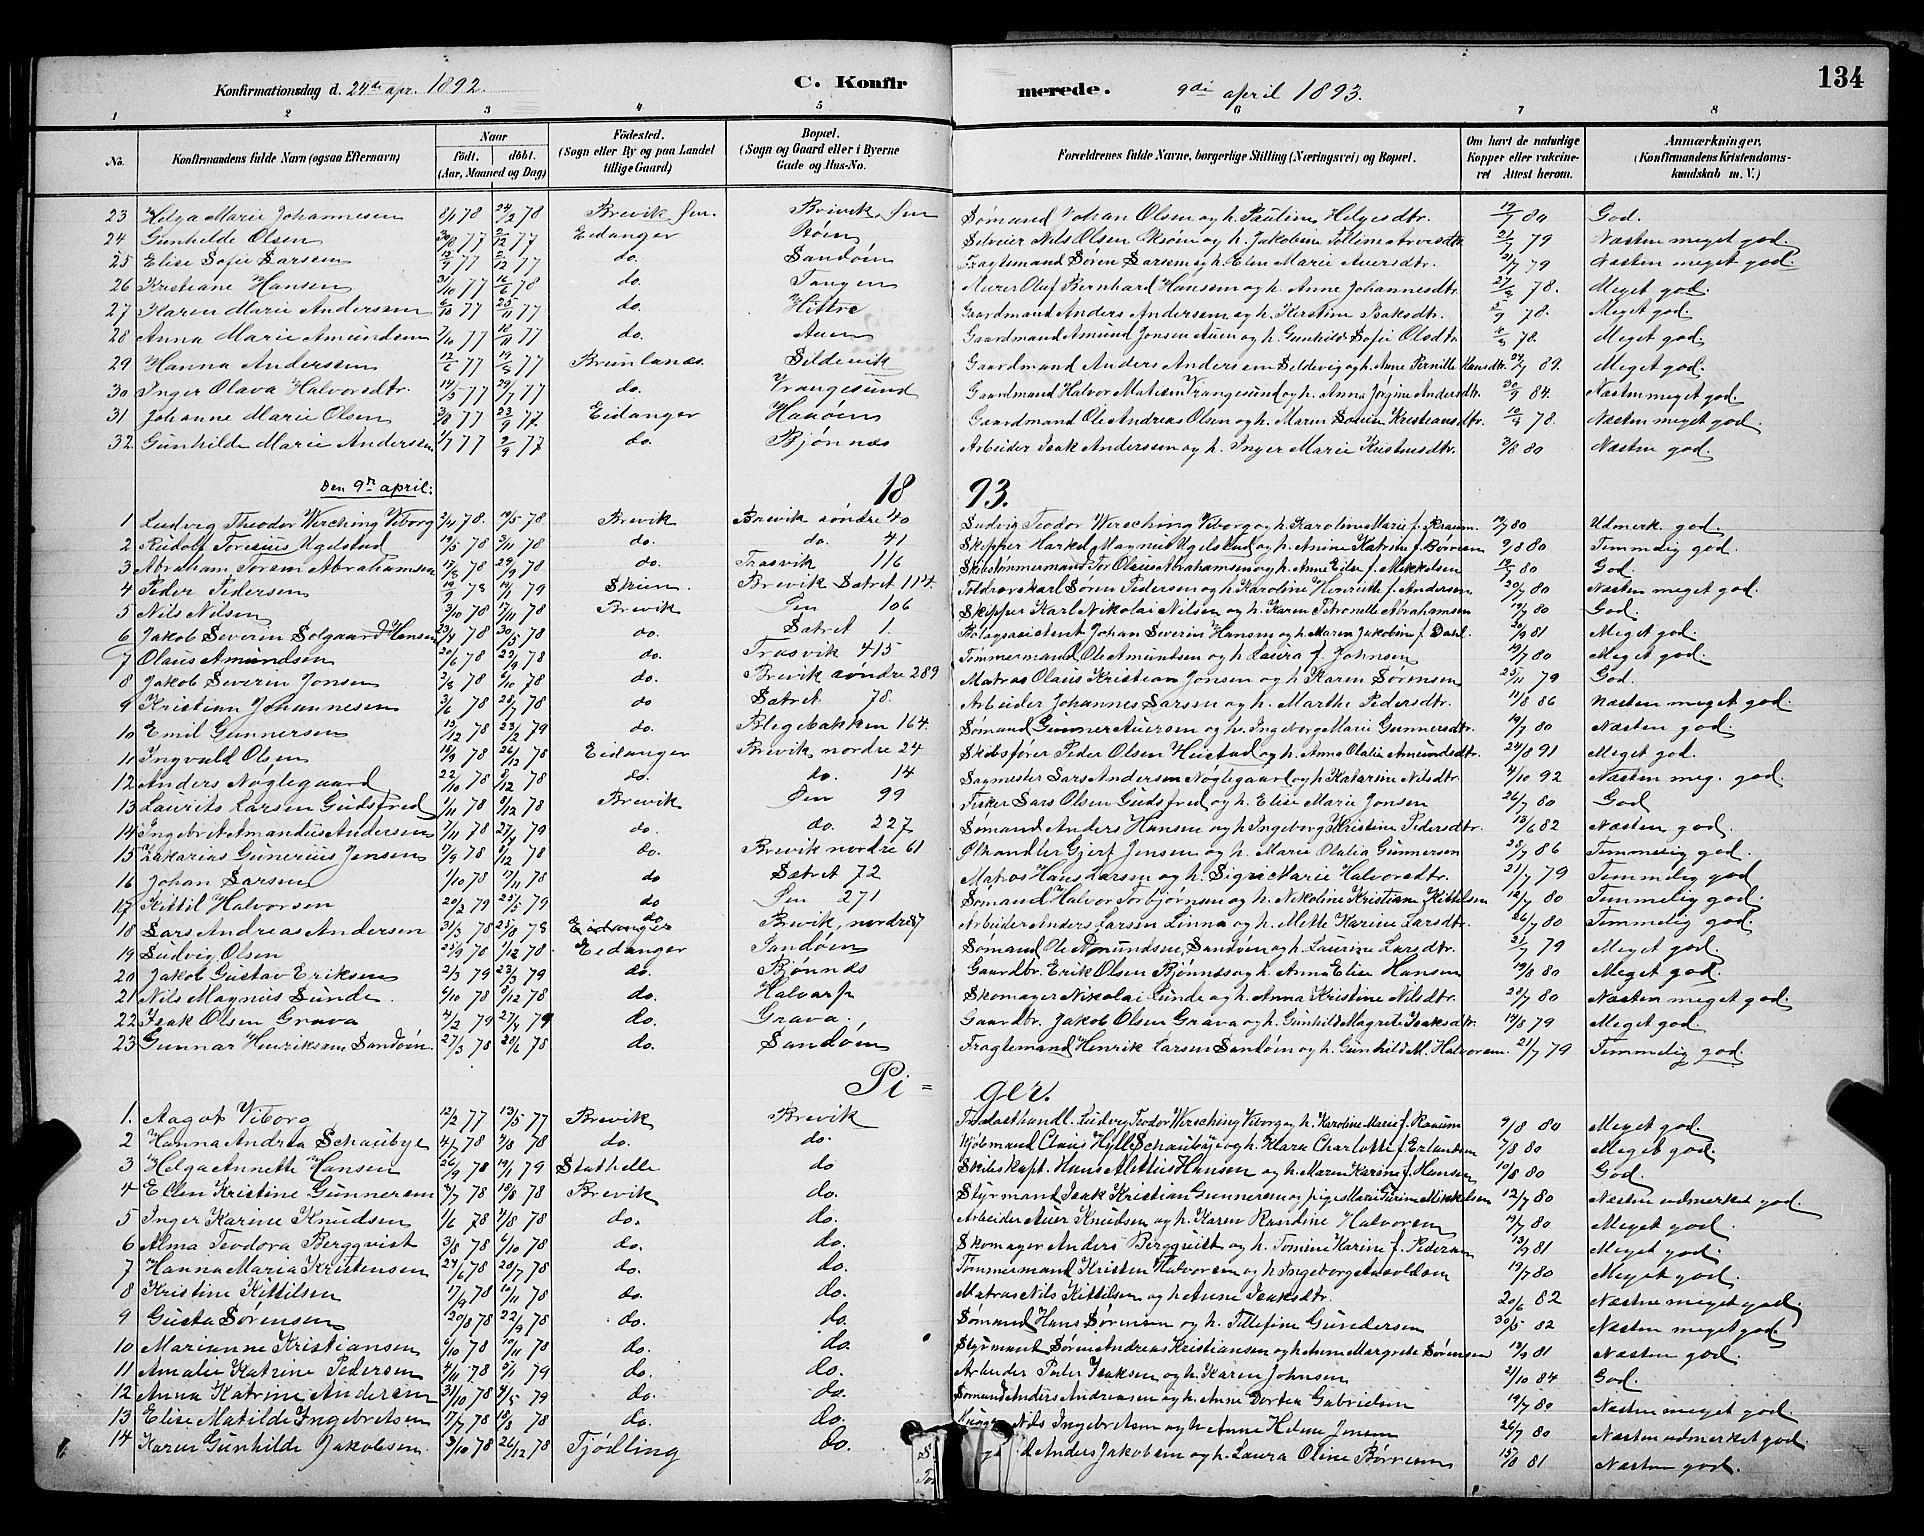 SAKO, Brevik kirkebøker, G/Ga/L0004: Klokkerbok nr. 4, 1882-1900, s. 134